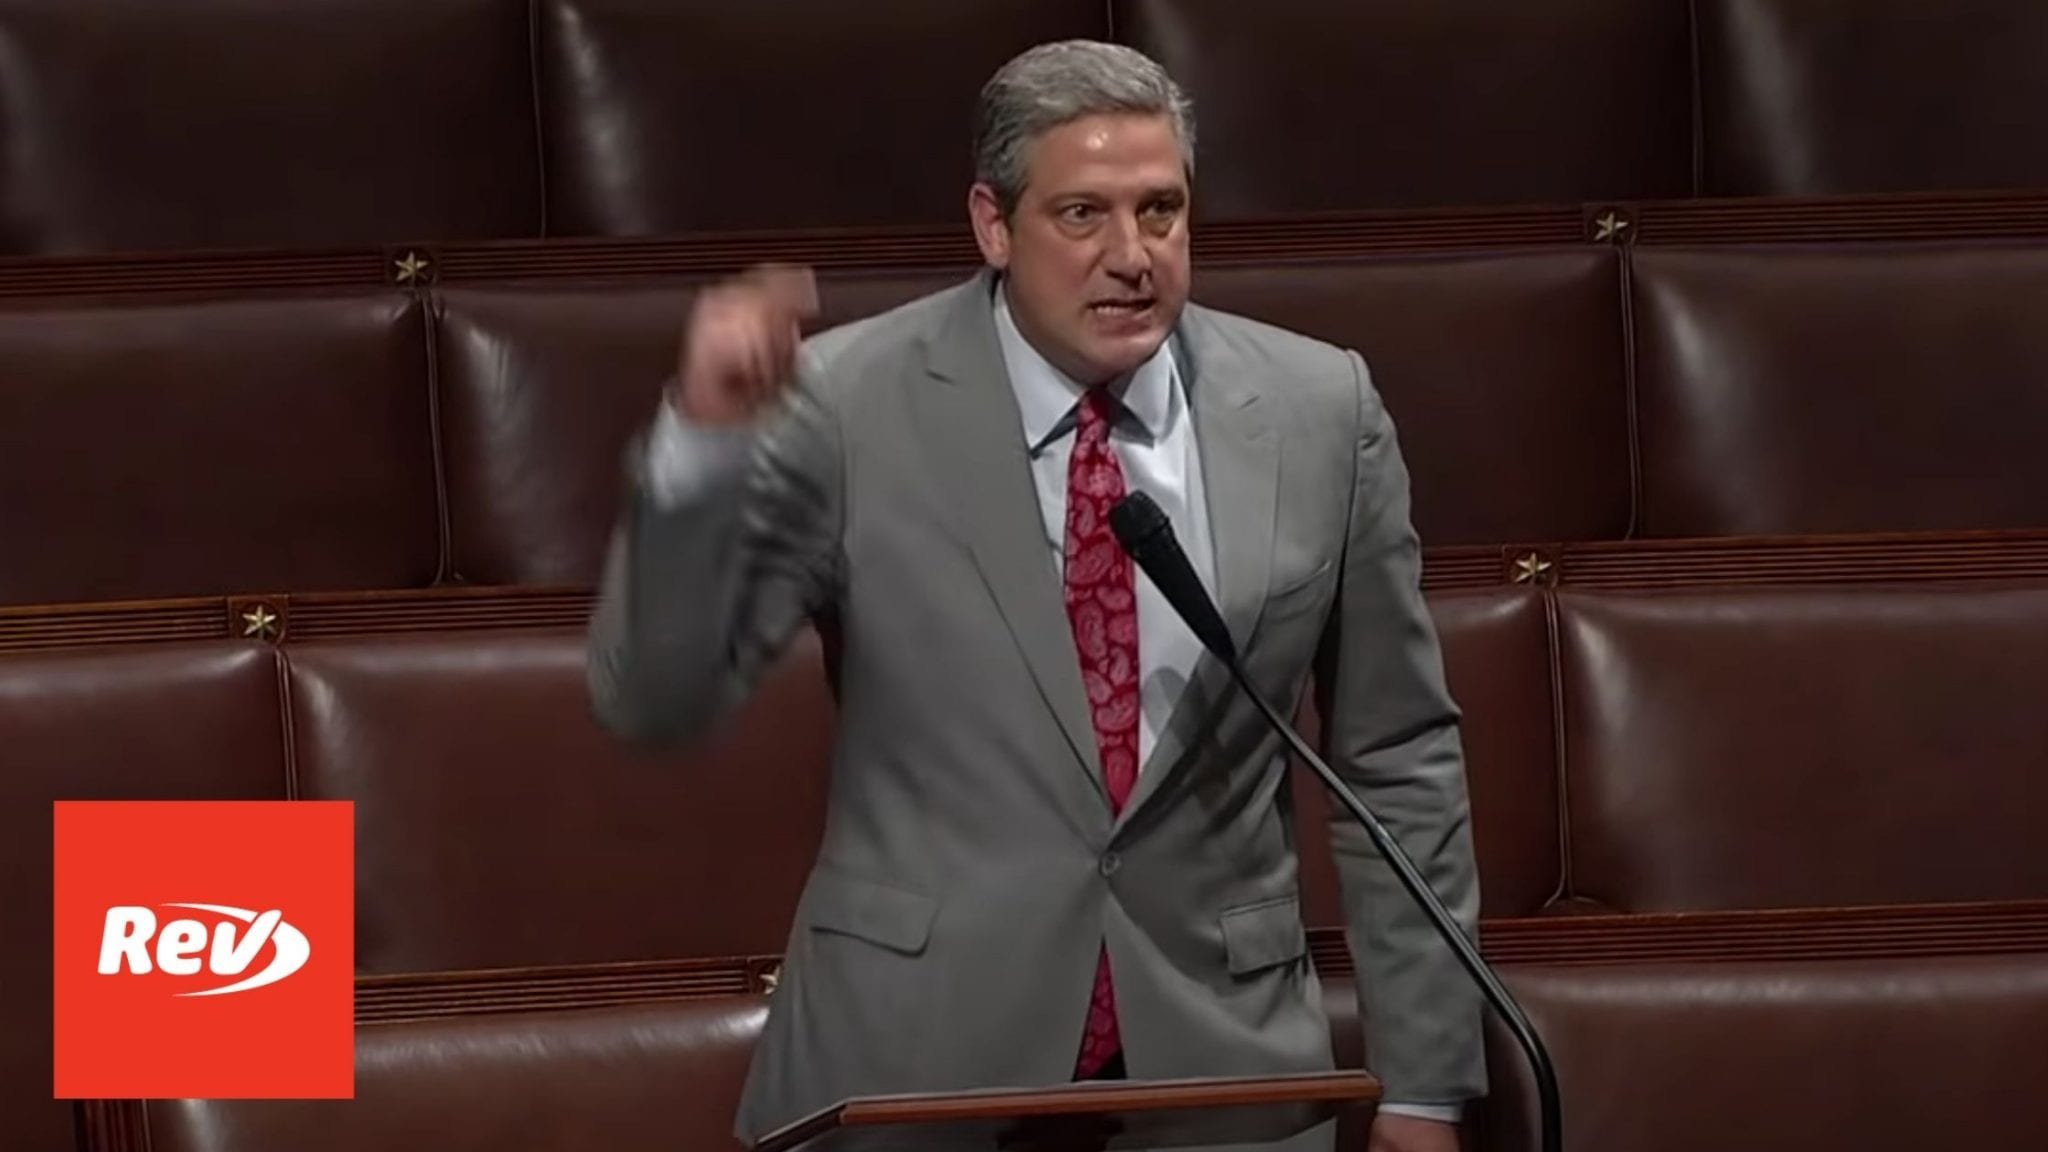 Rep. Tim Ryan January 6 Commission House Floor Speech Transcript